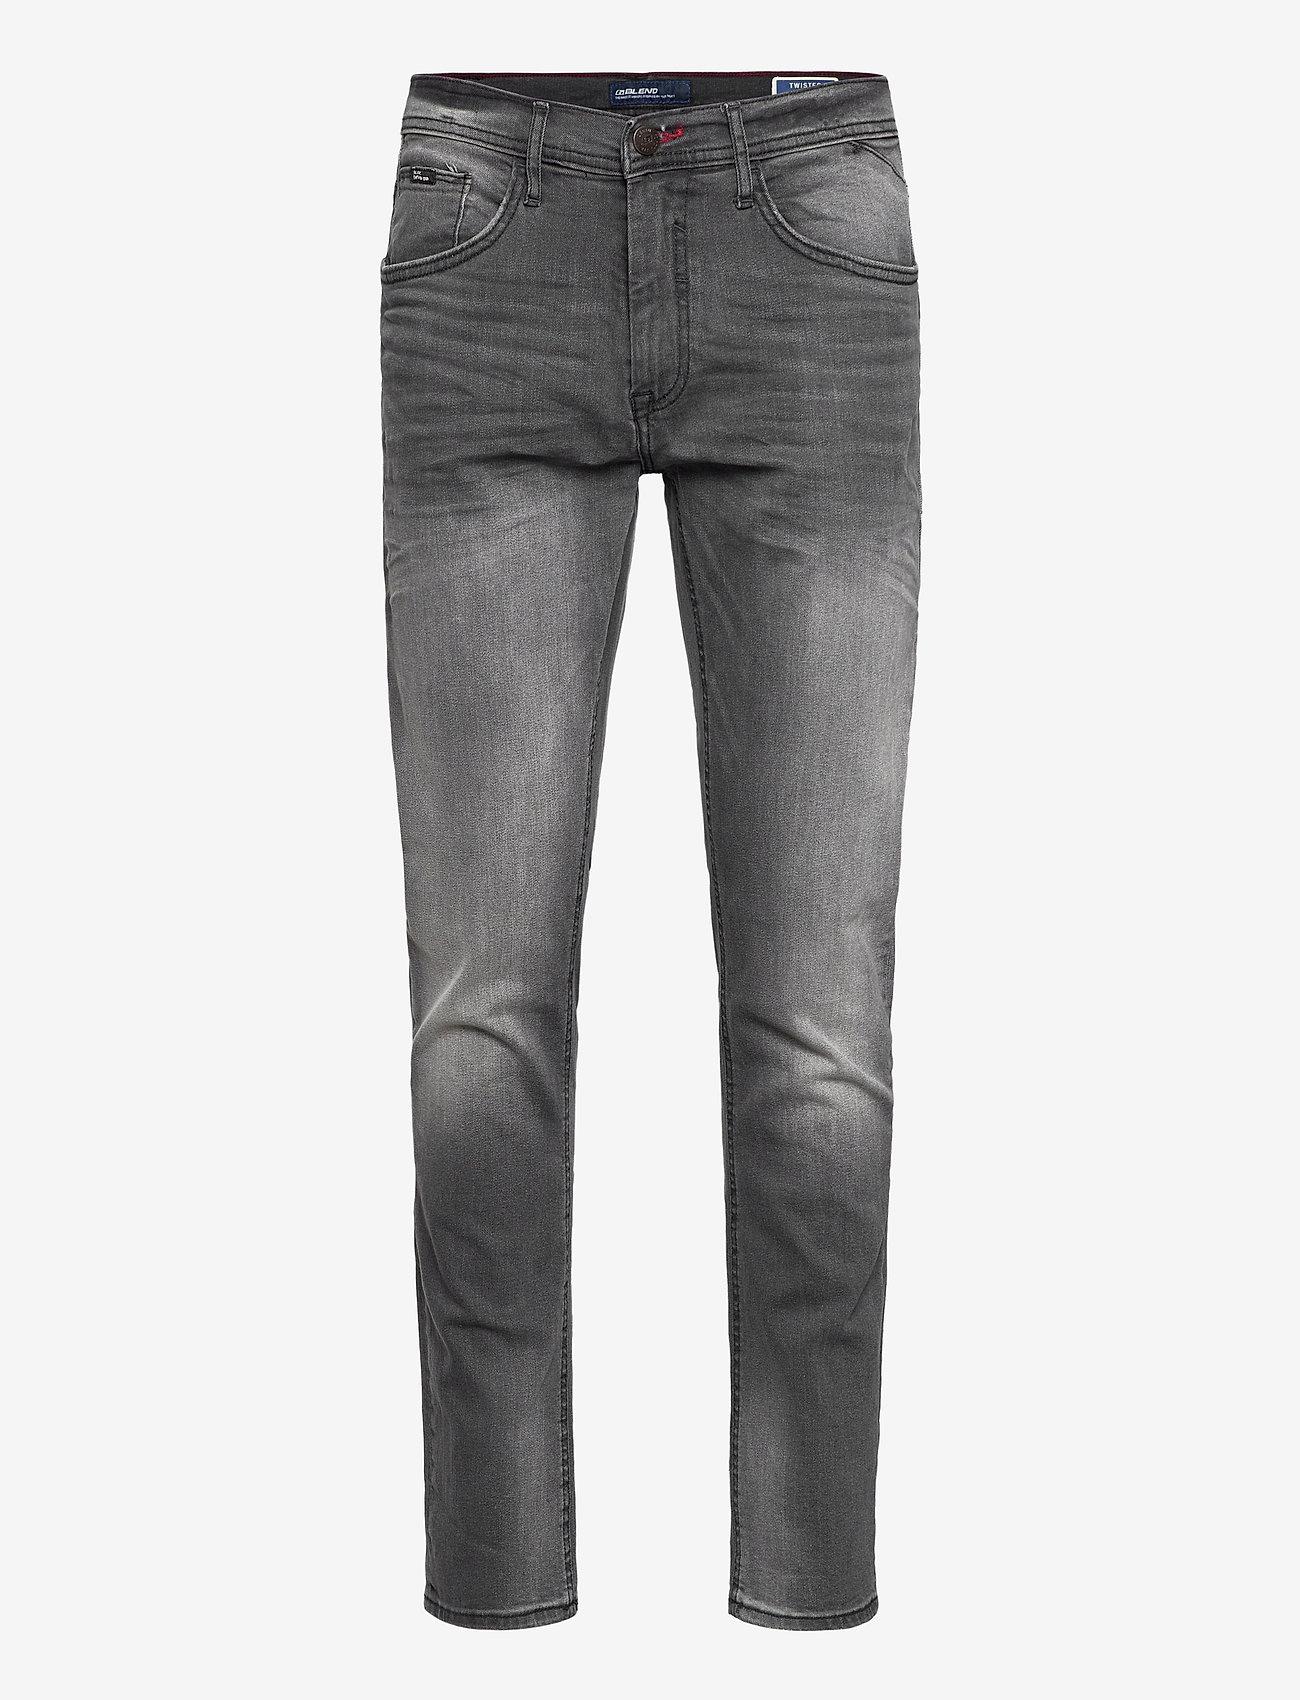 Blend - Jeans - Clean - slim jeans - denim grey - 0